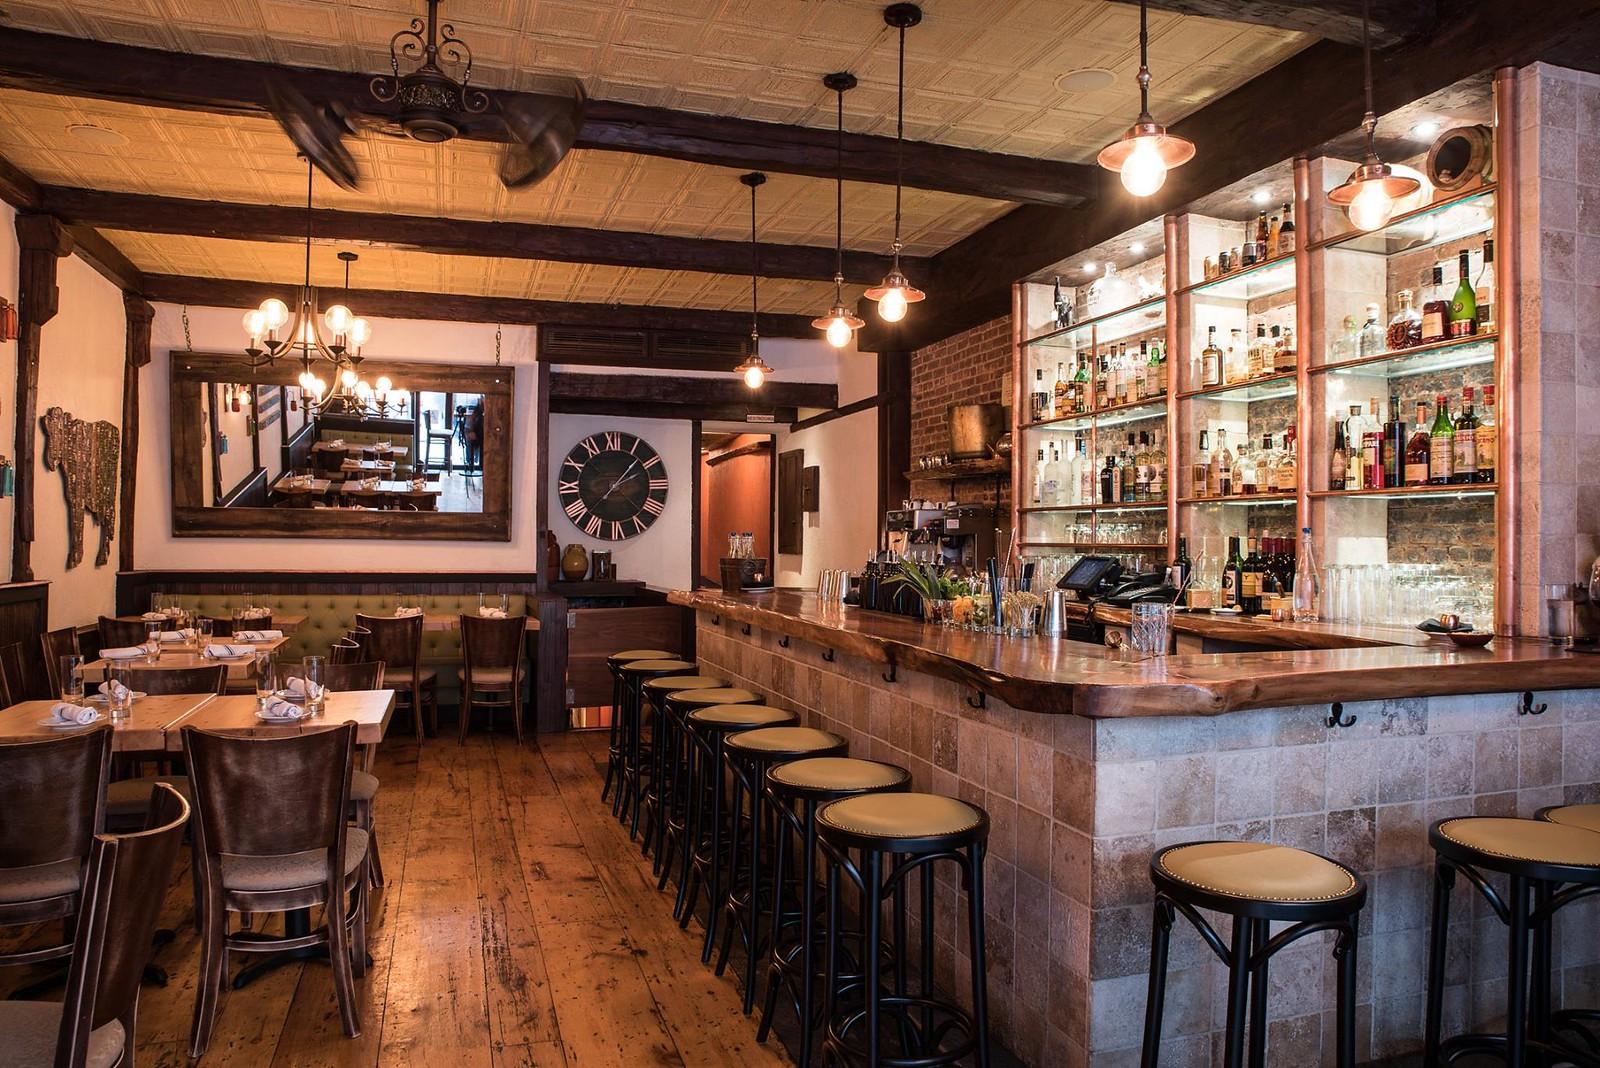 Copper Kettle Kitchen In The Upper East Side Socially